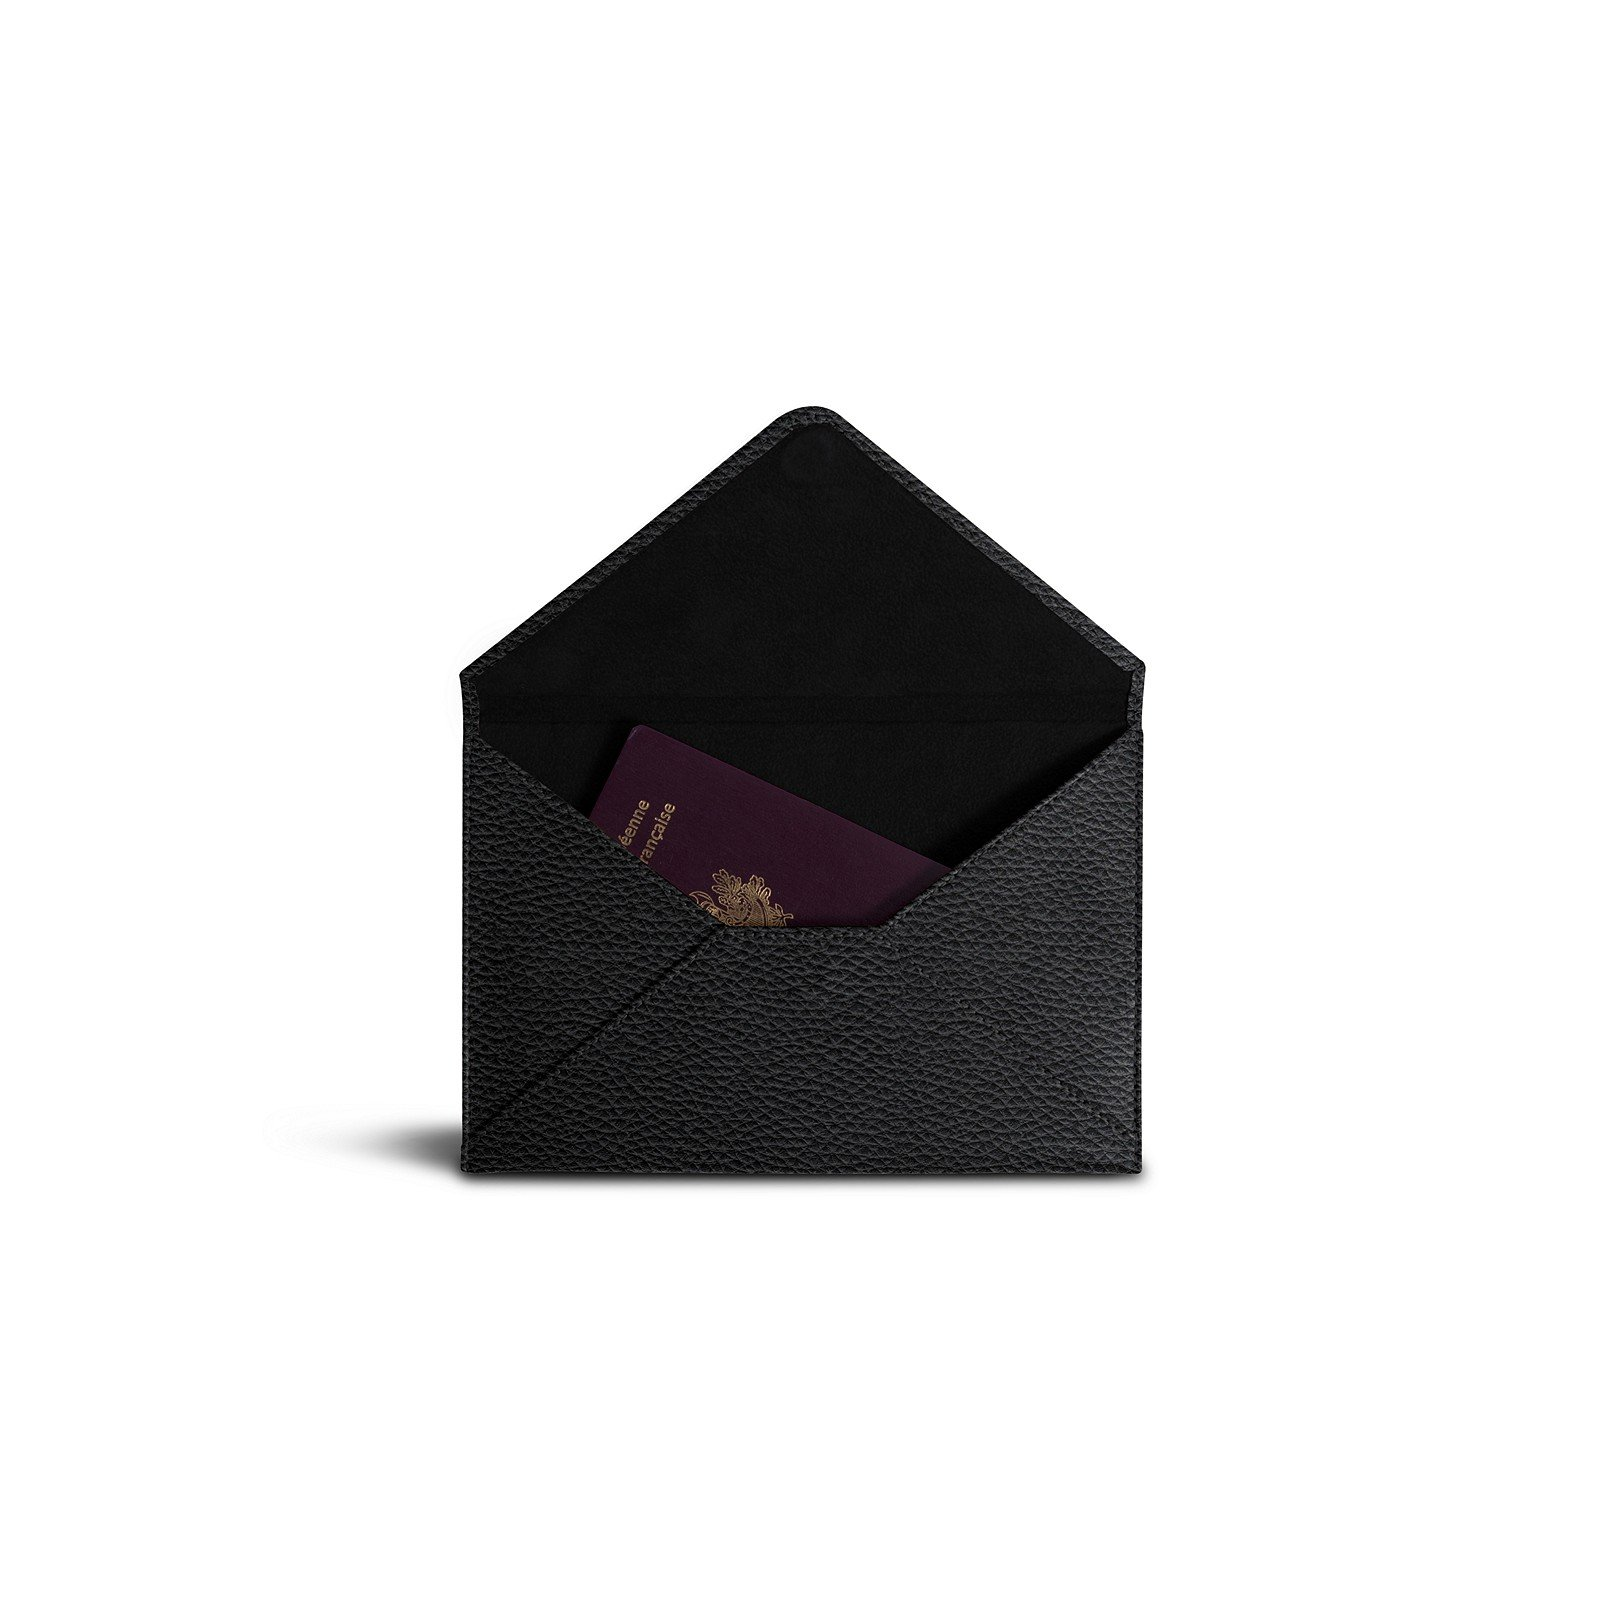 Lucrin - Medium envelope - Black - Granulated Leather